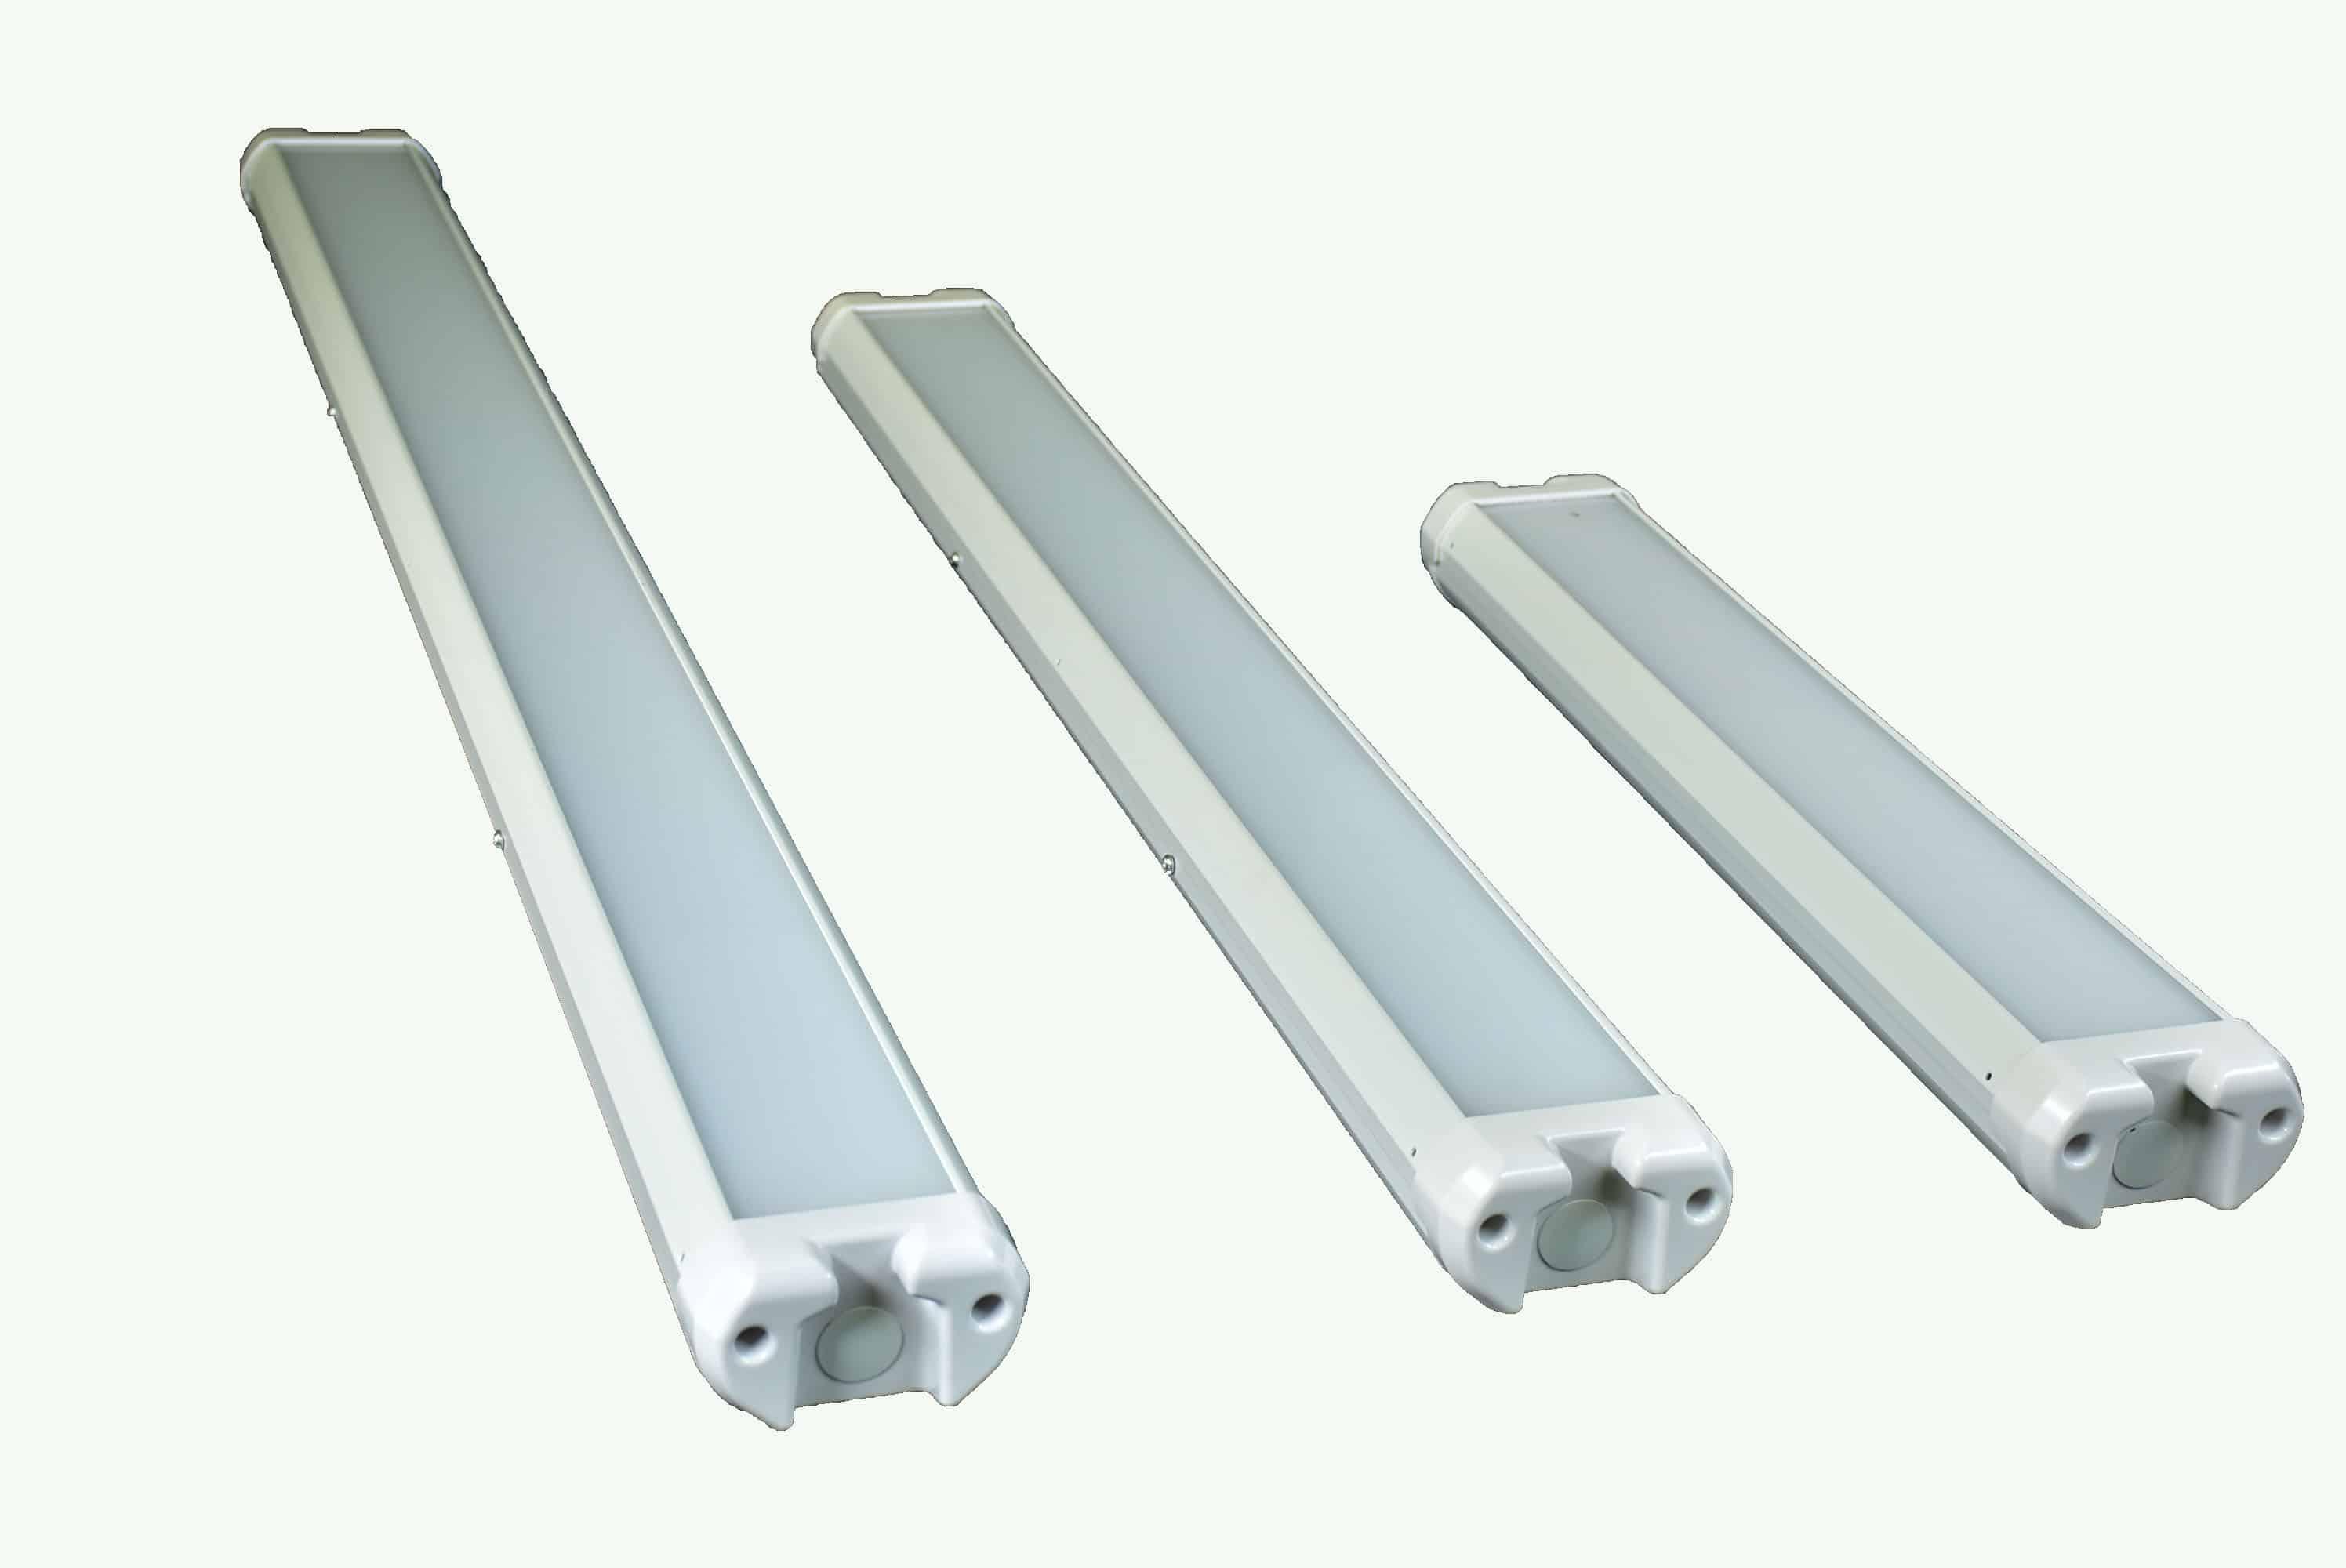 LED Linear( Low Bay ) Shop Light